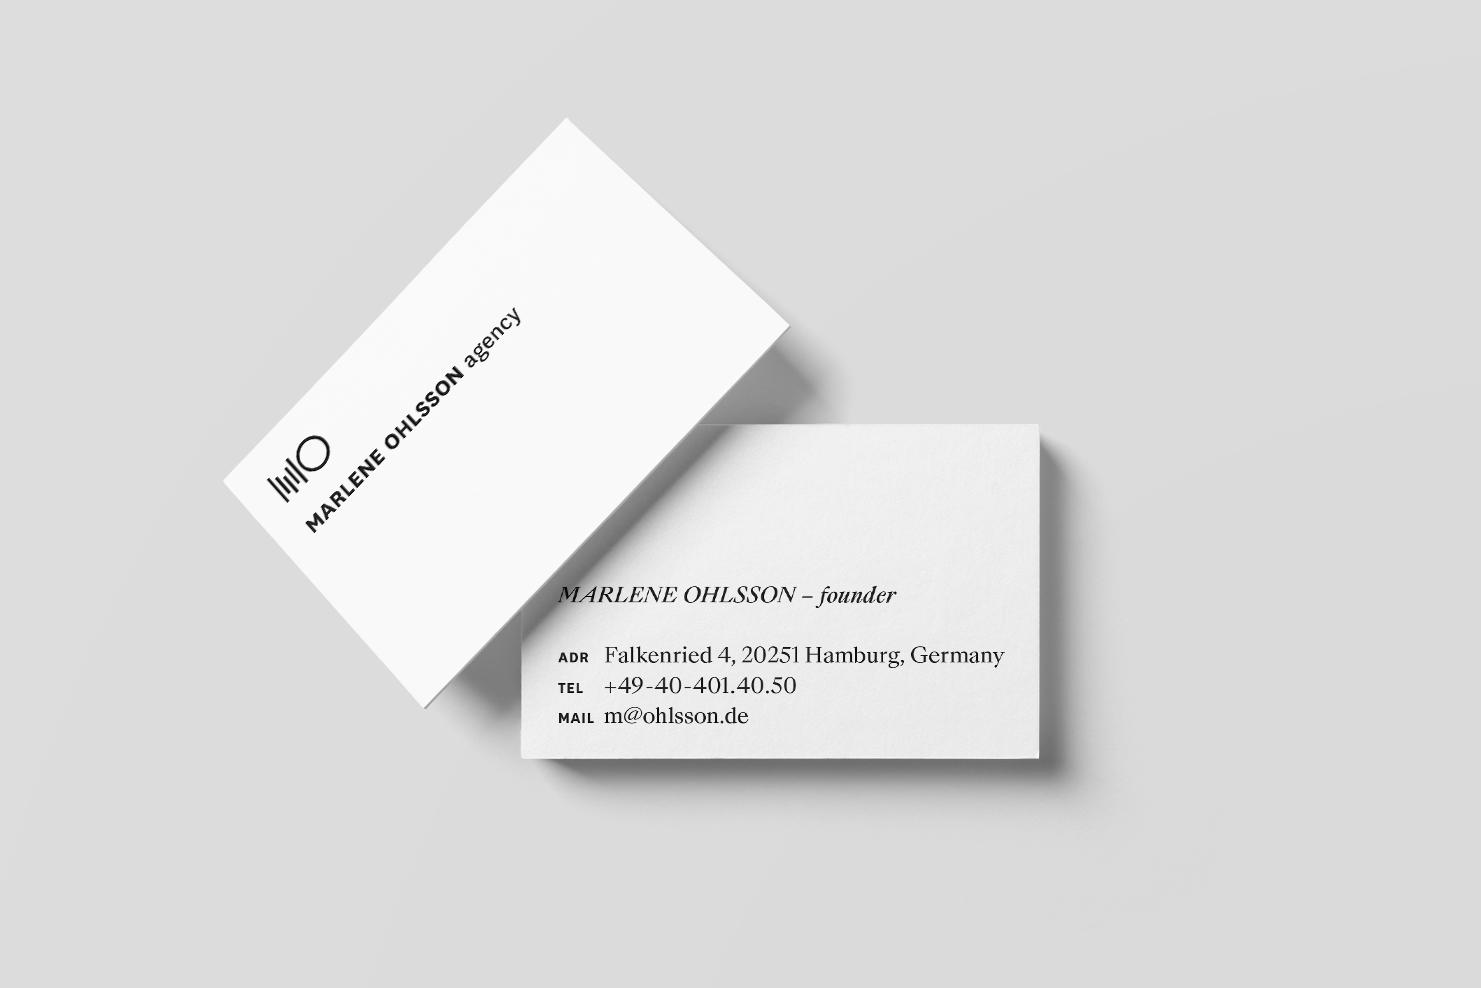 m2hs_marlene-ohlsson-stationary_01